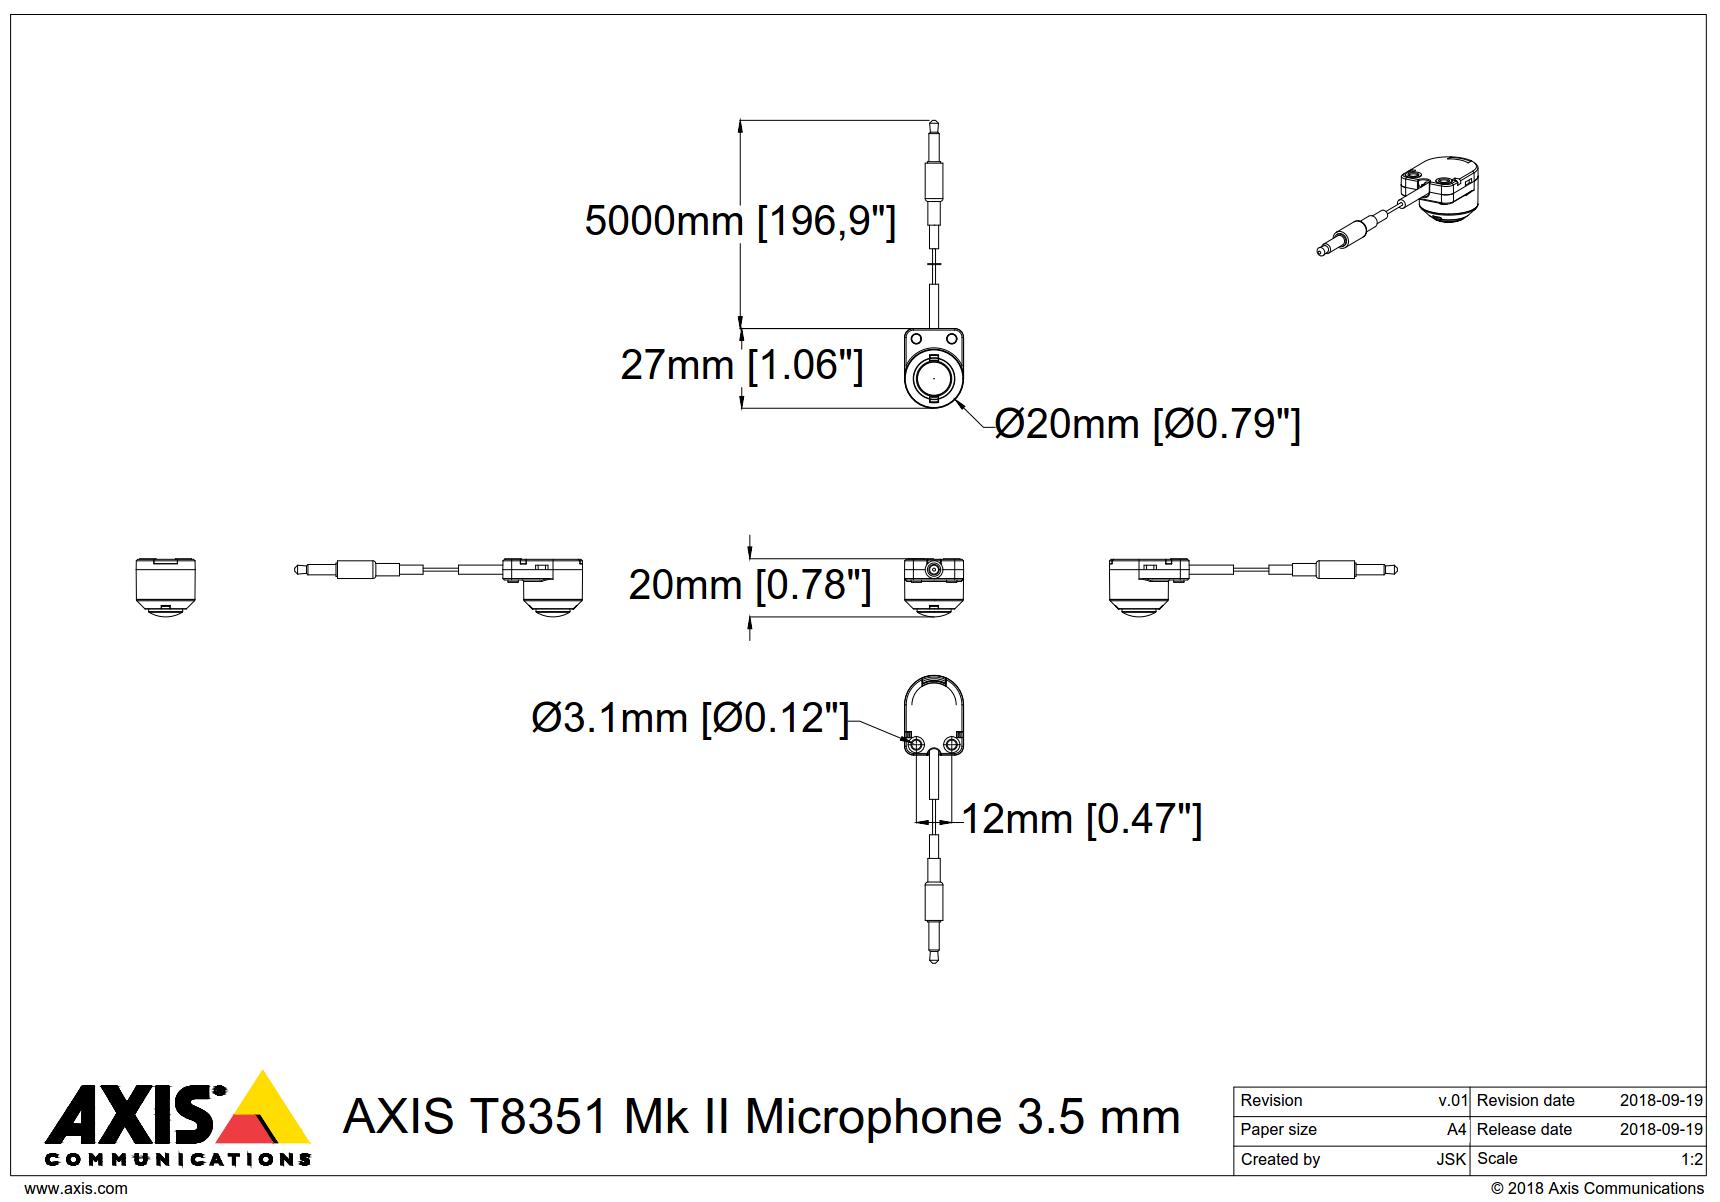 T8351 Mk II Dimensions